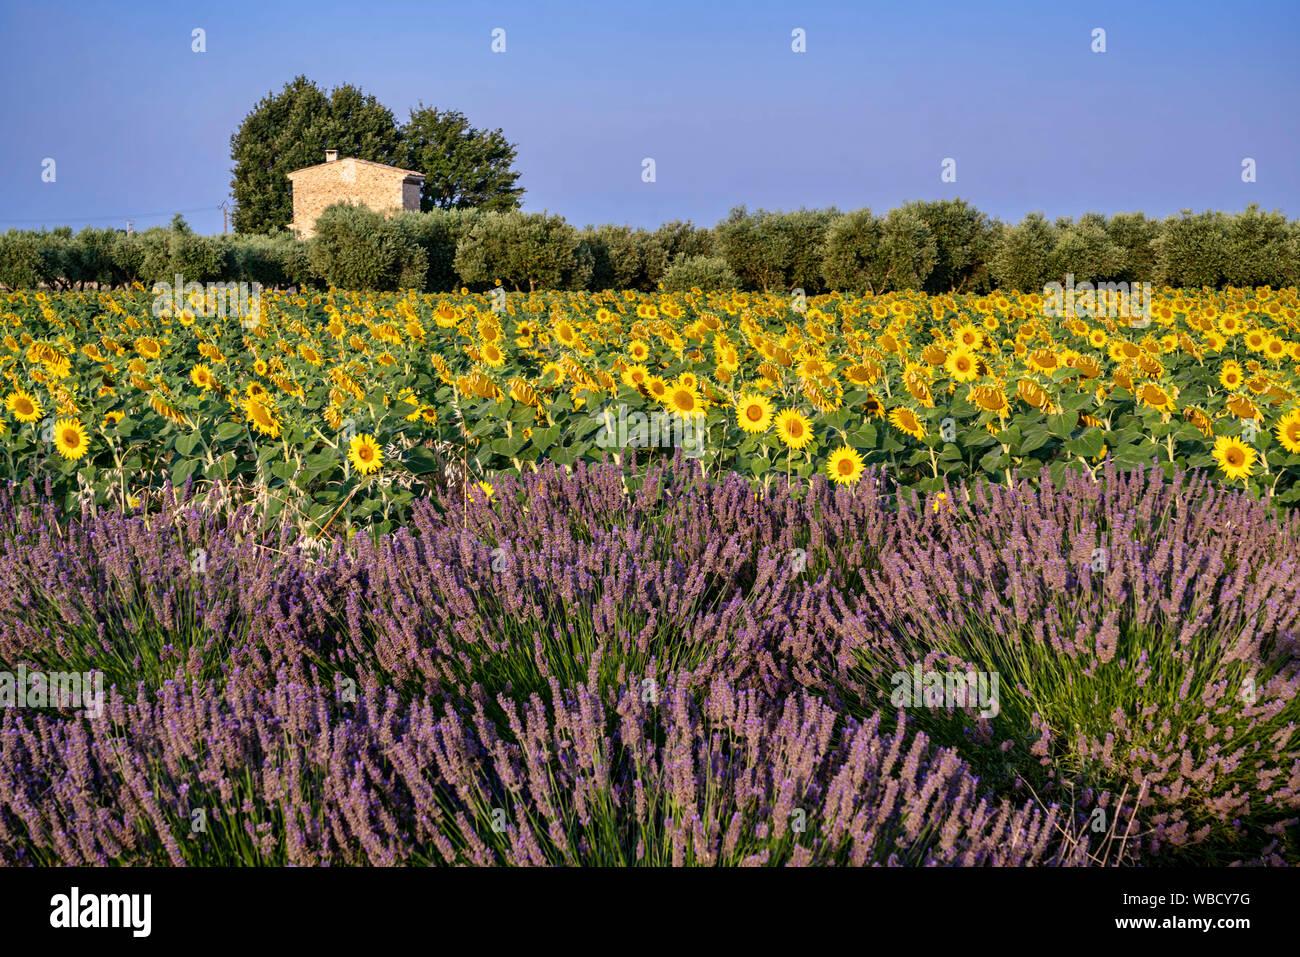 La lavanda y el campo de girasol, Lavandula angustifolia, la Meseta de Valensole, Francia Provence-Alpes-Côte d'Azur, Francia Foto de stock